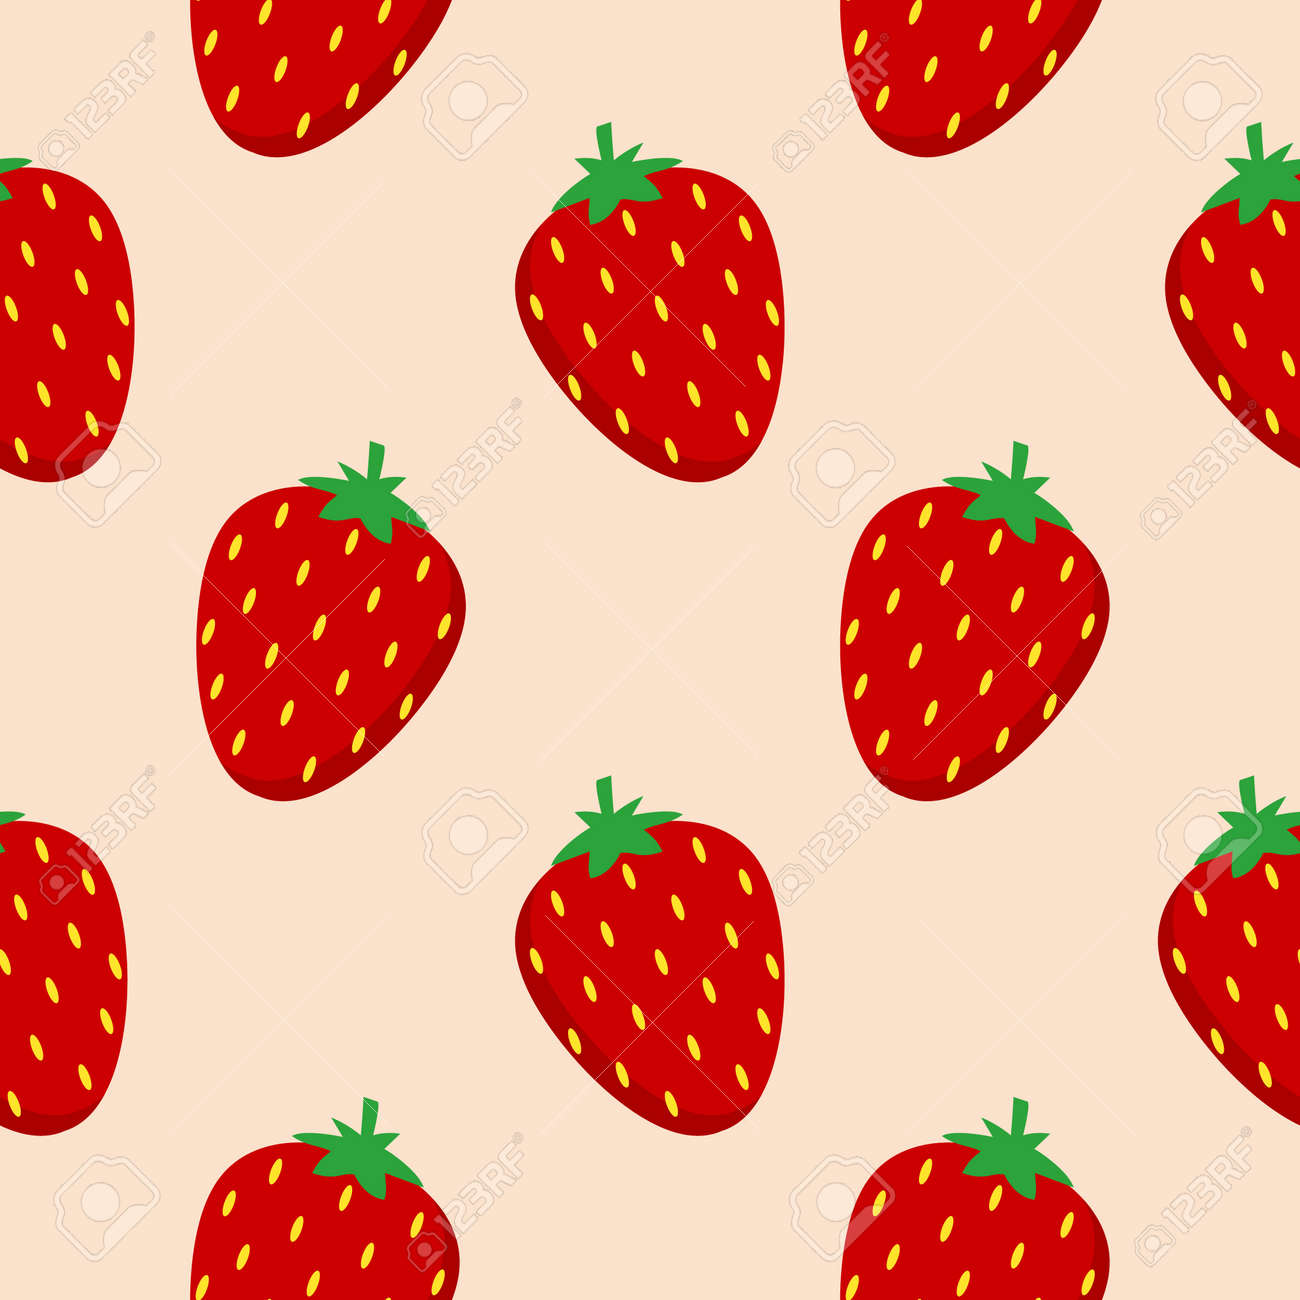 strawberry flat design seamless pattern. Vector illustration of art. Vintage background. Kitchen and restaurant design for fabrics, paper - 168203981